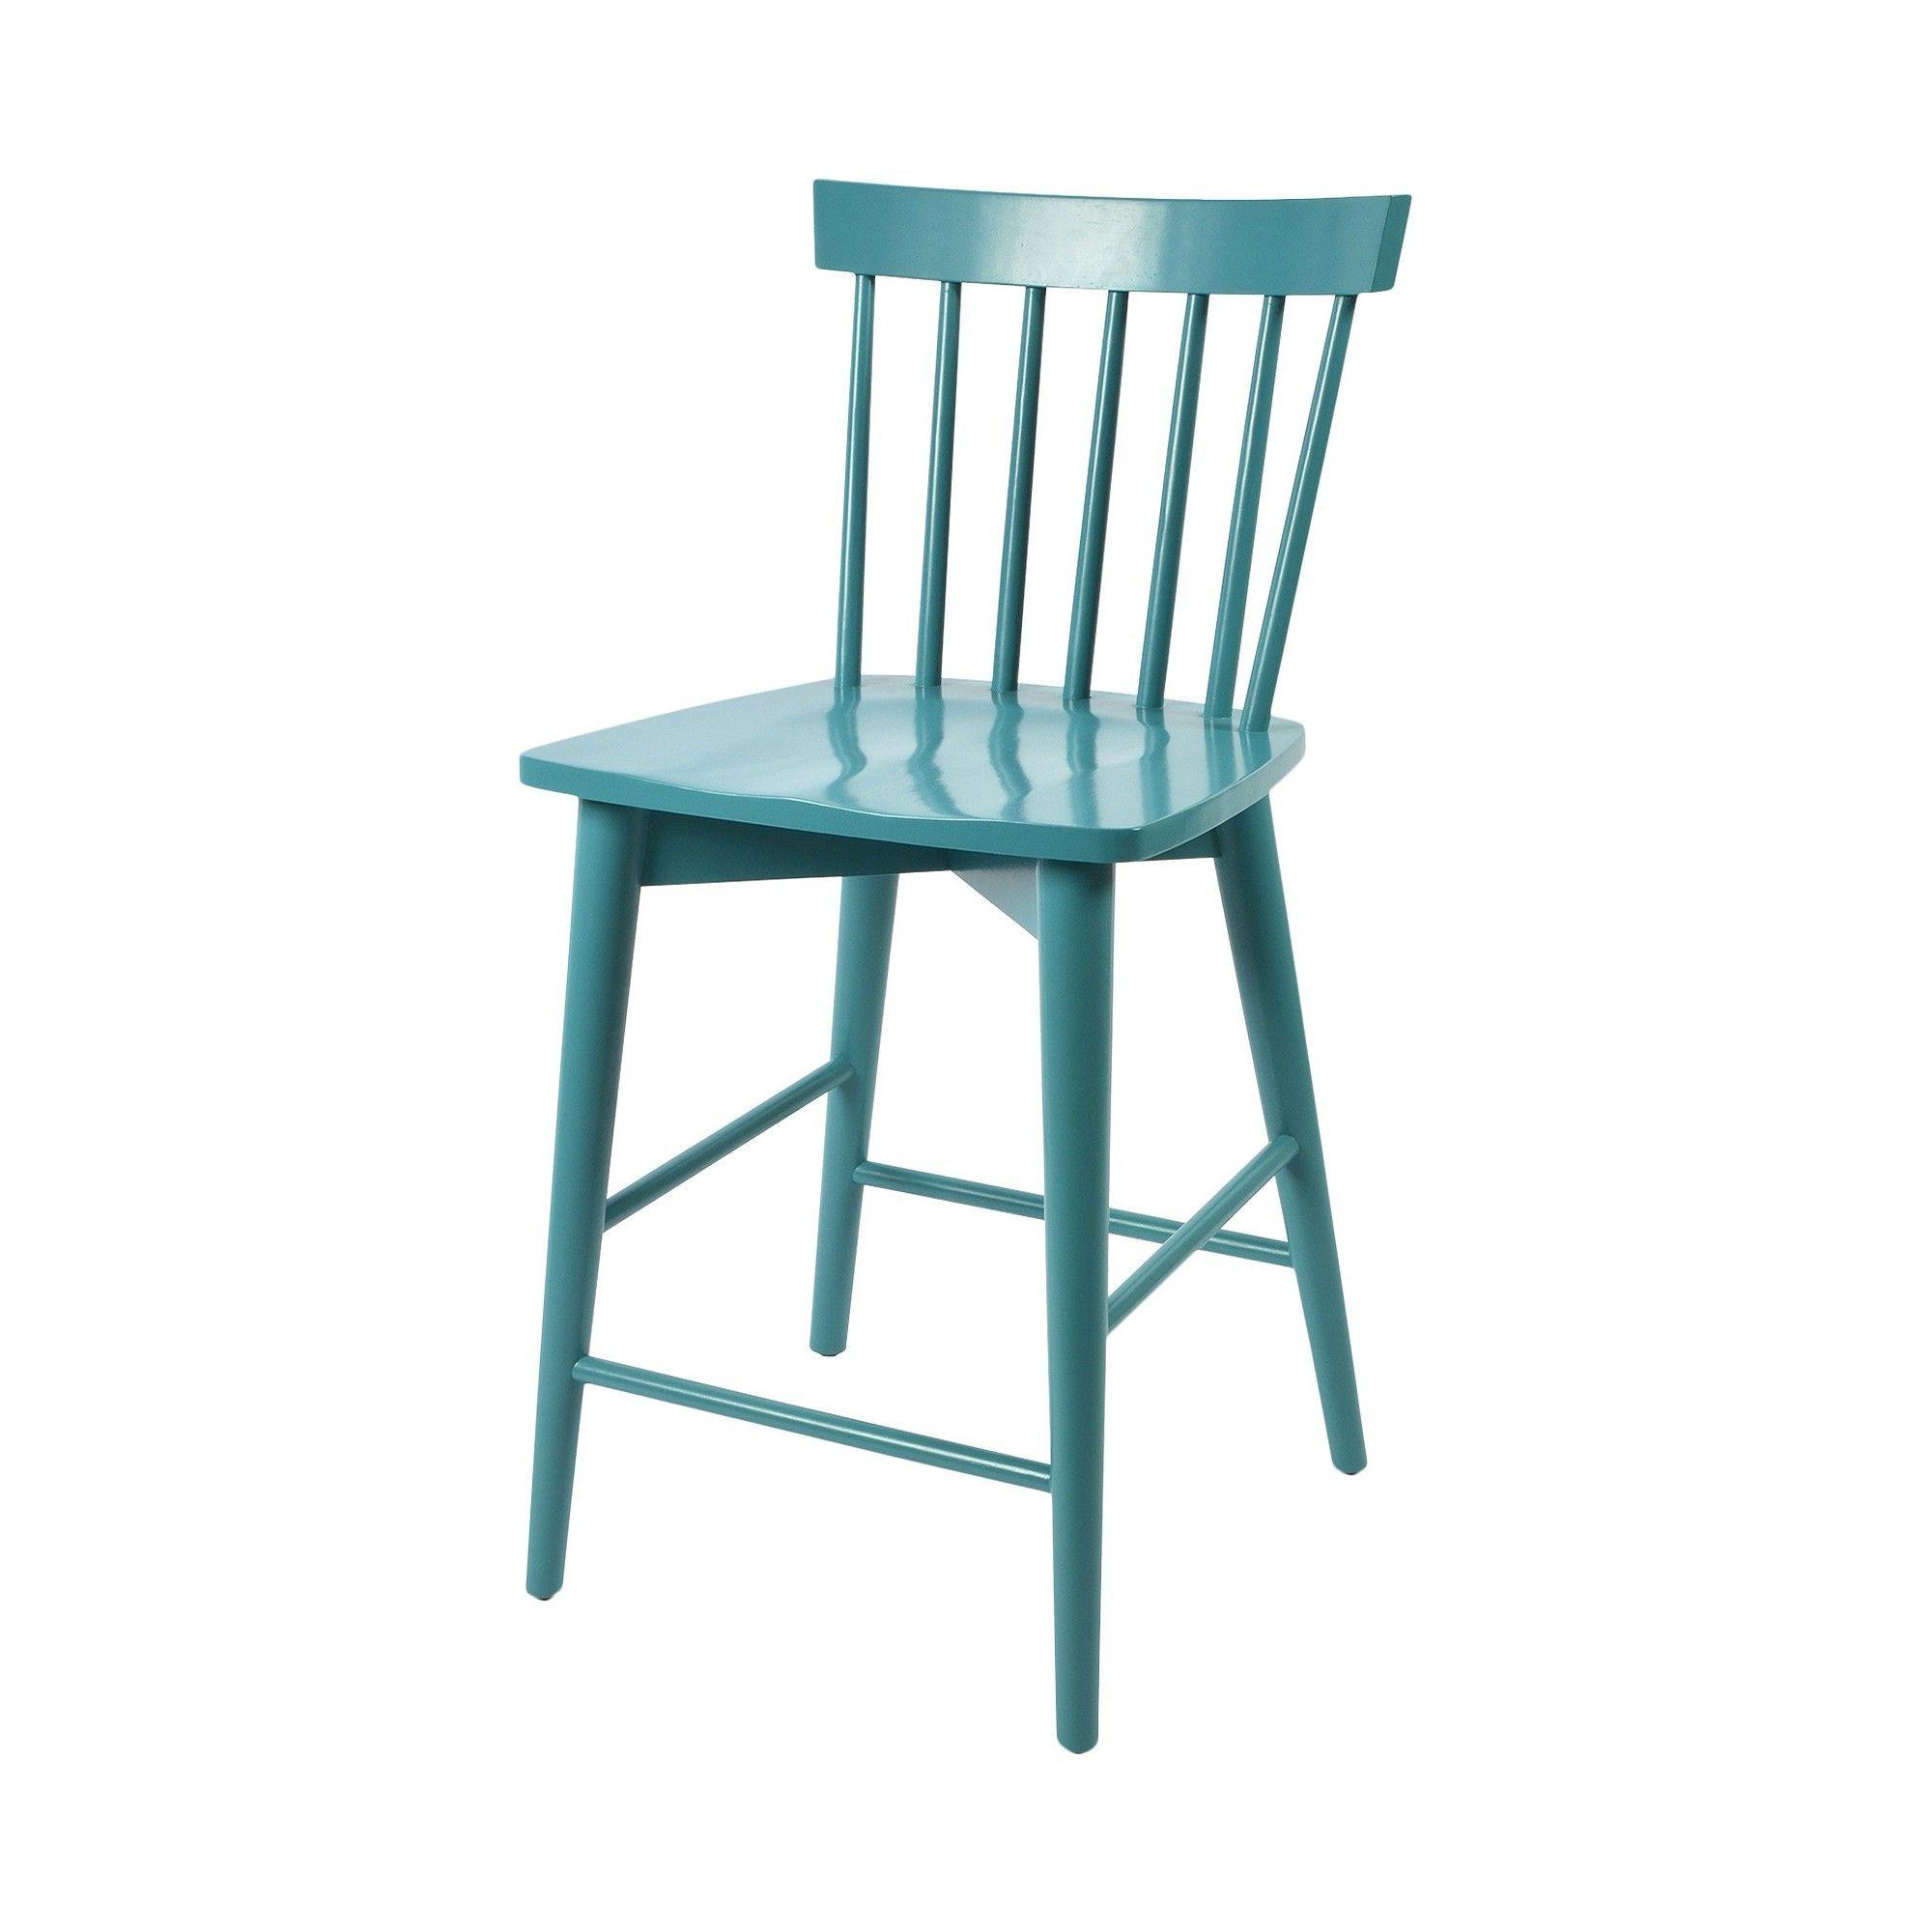 Windsor 24 Counter Stool Hardwood - Threshold, Blue | Pinterest ...